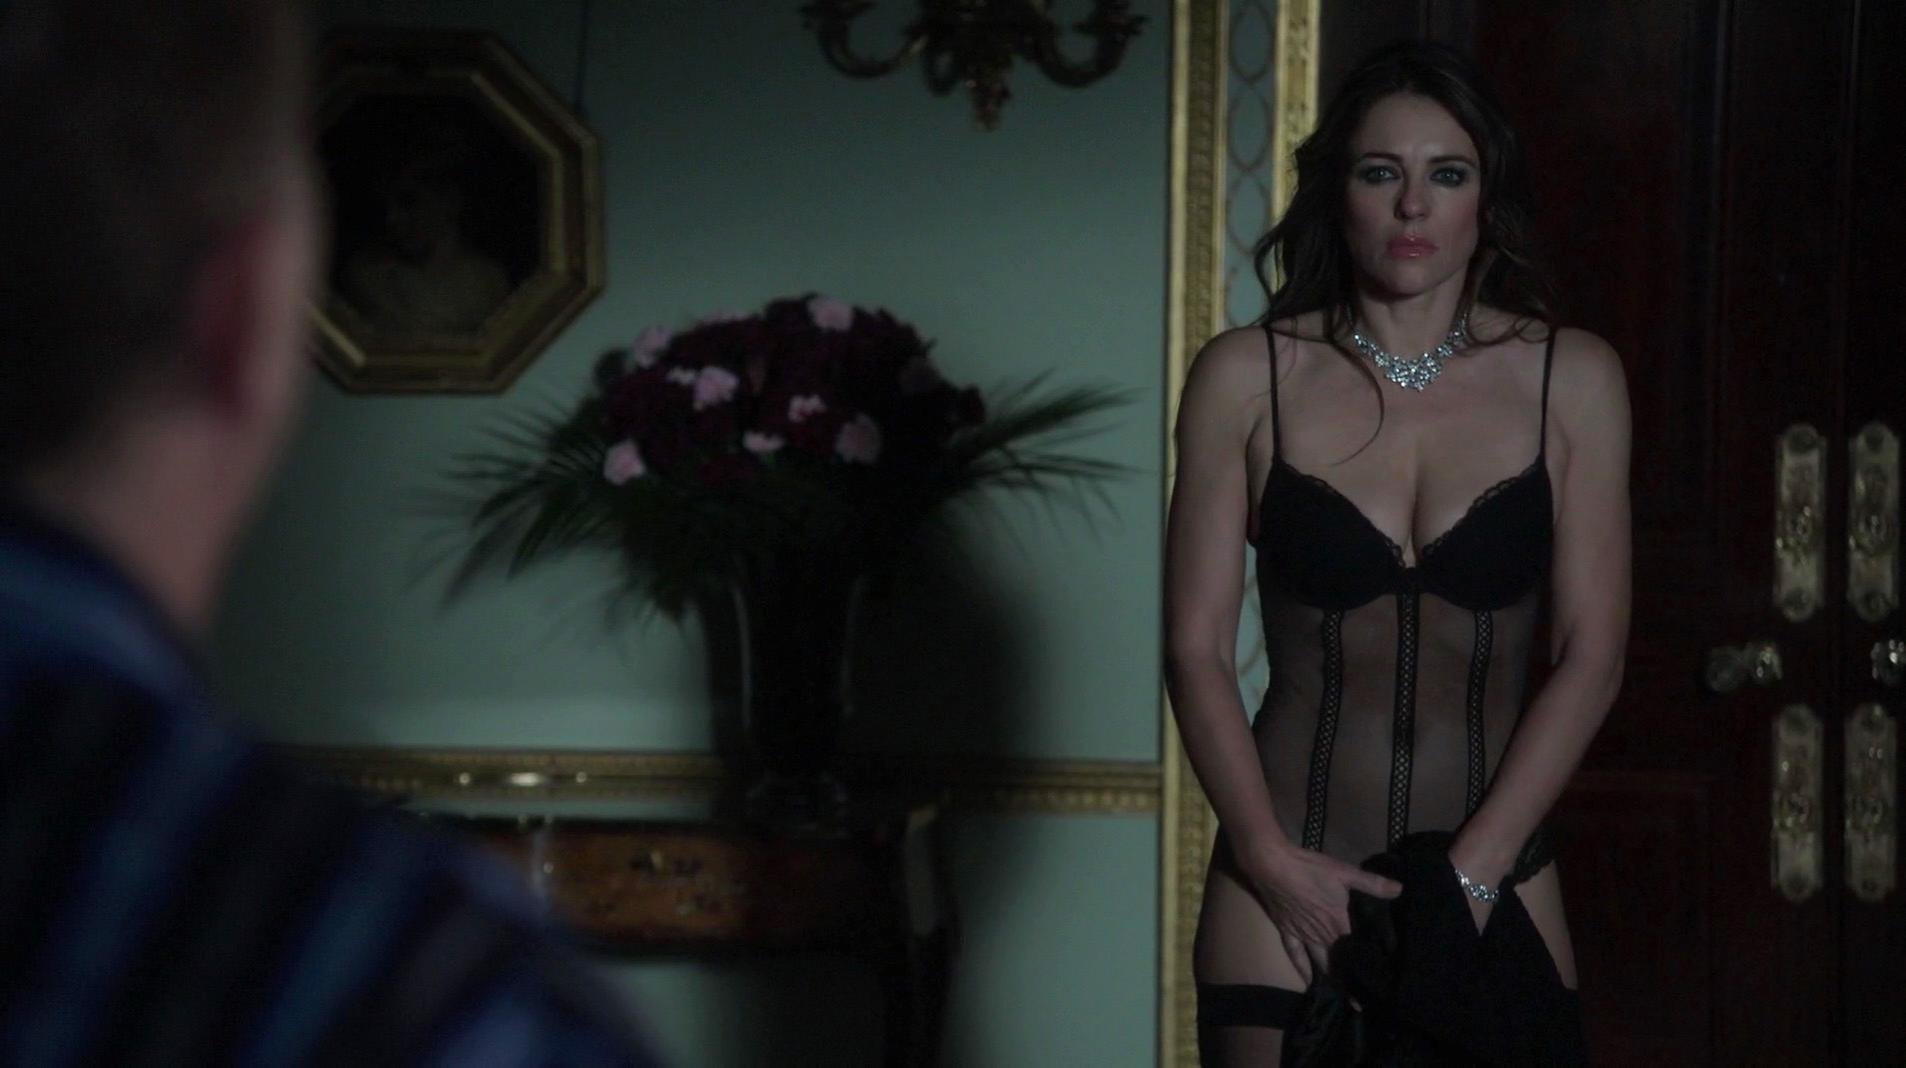 Merritt Patterson sexy, Elizabeth Hurley sexy, Alexandra Park sexy - The Royals s01e01 (2015)